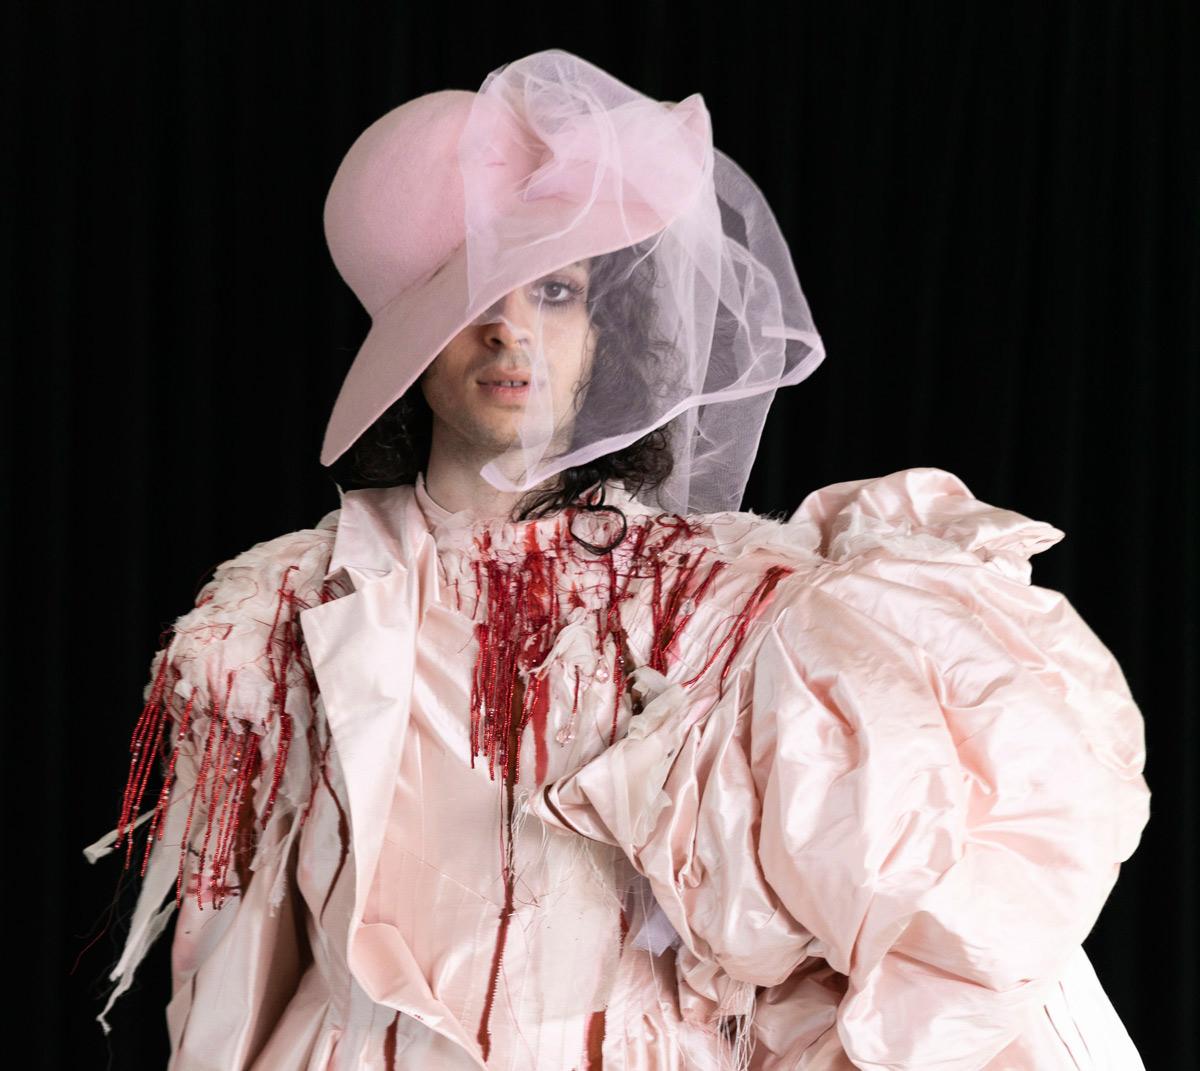 fashioners-of-the-world-2020-valentina-taylor-10